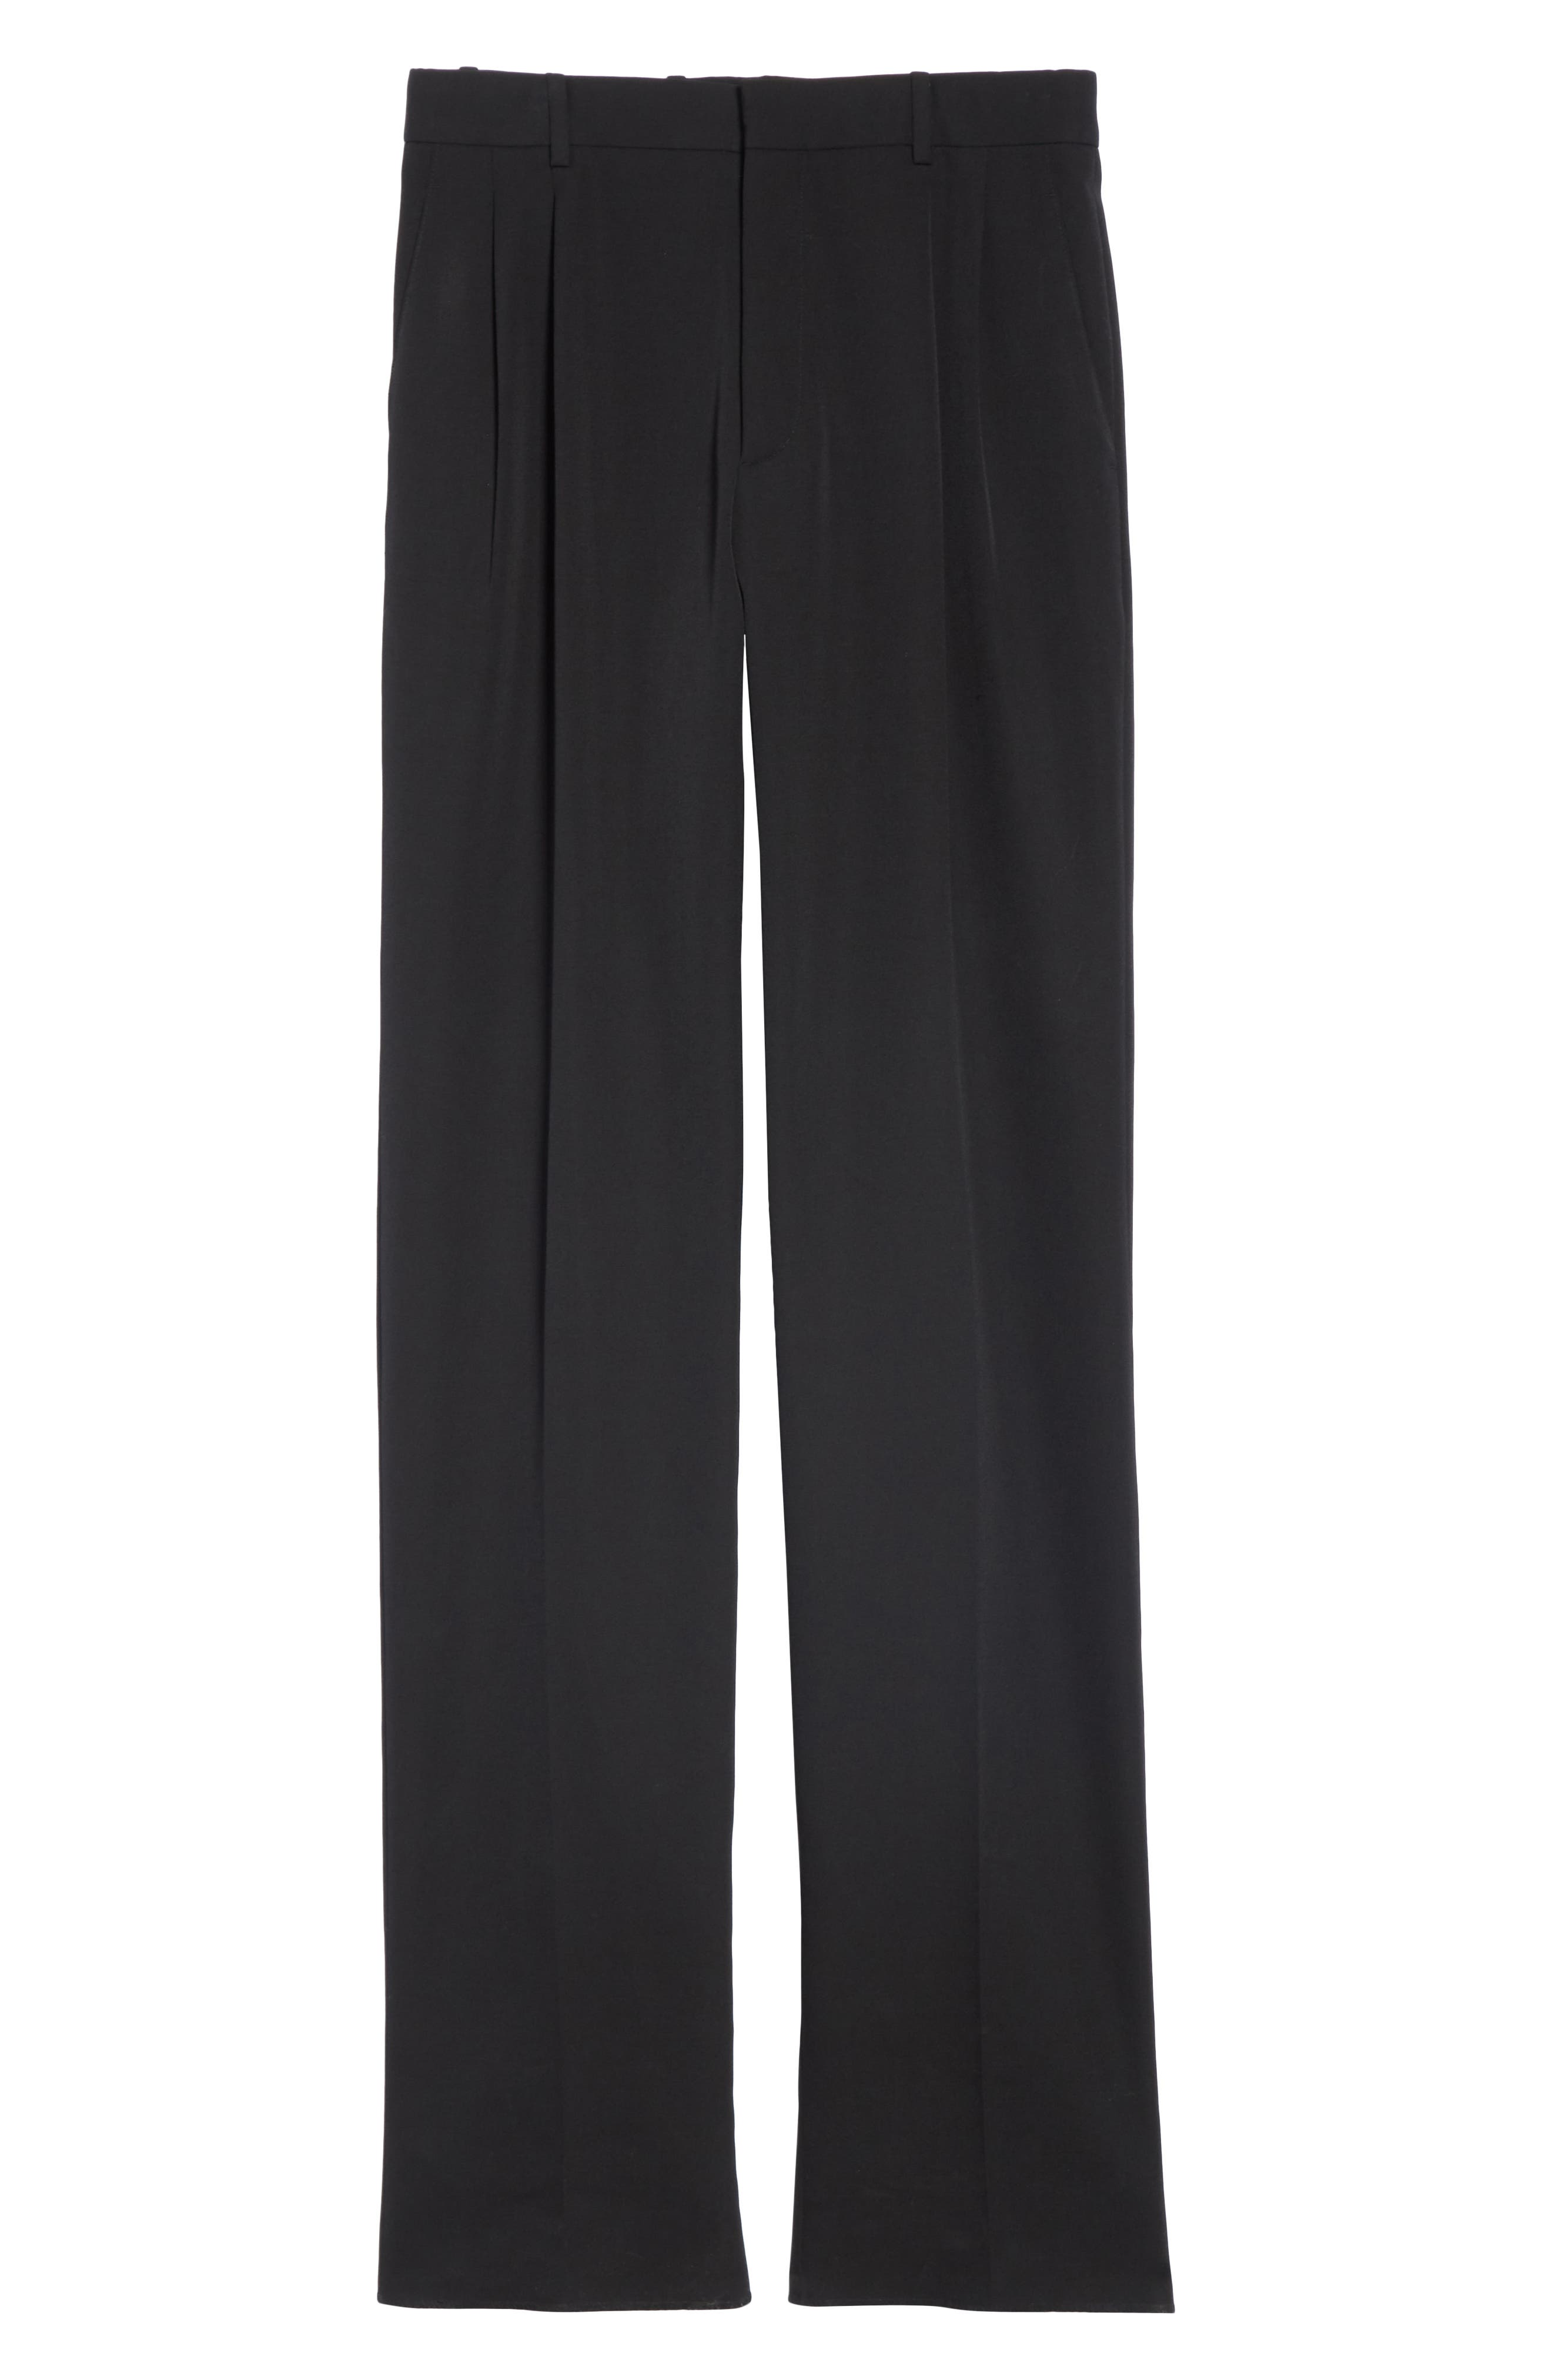 CALVIN KLEIN 205W39NYC, Wool Gabardine Pants, Alternate thumbnail 6, color, BLACK